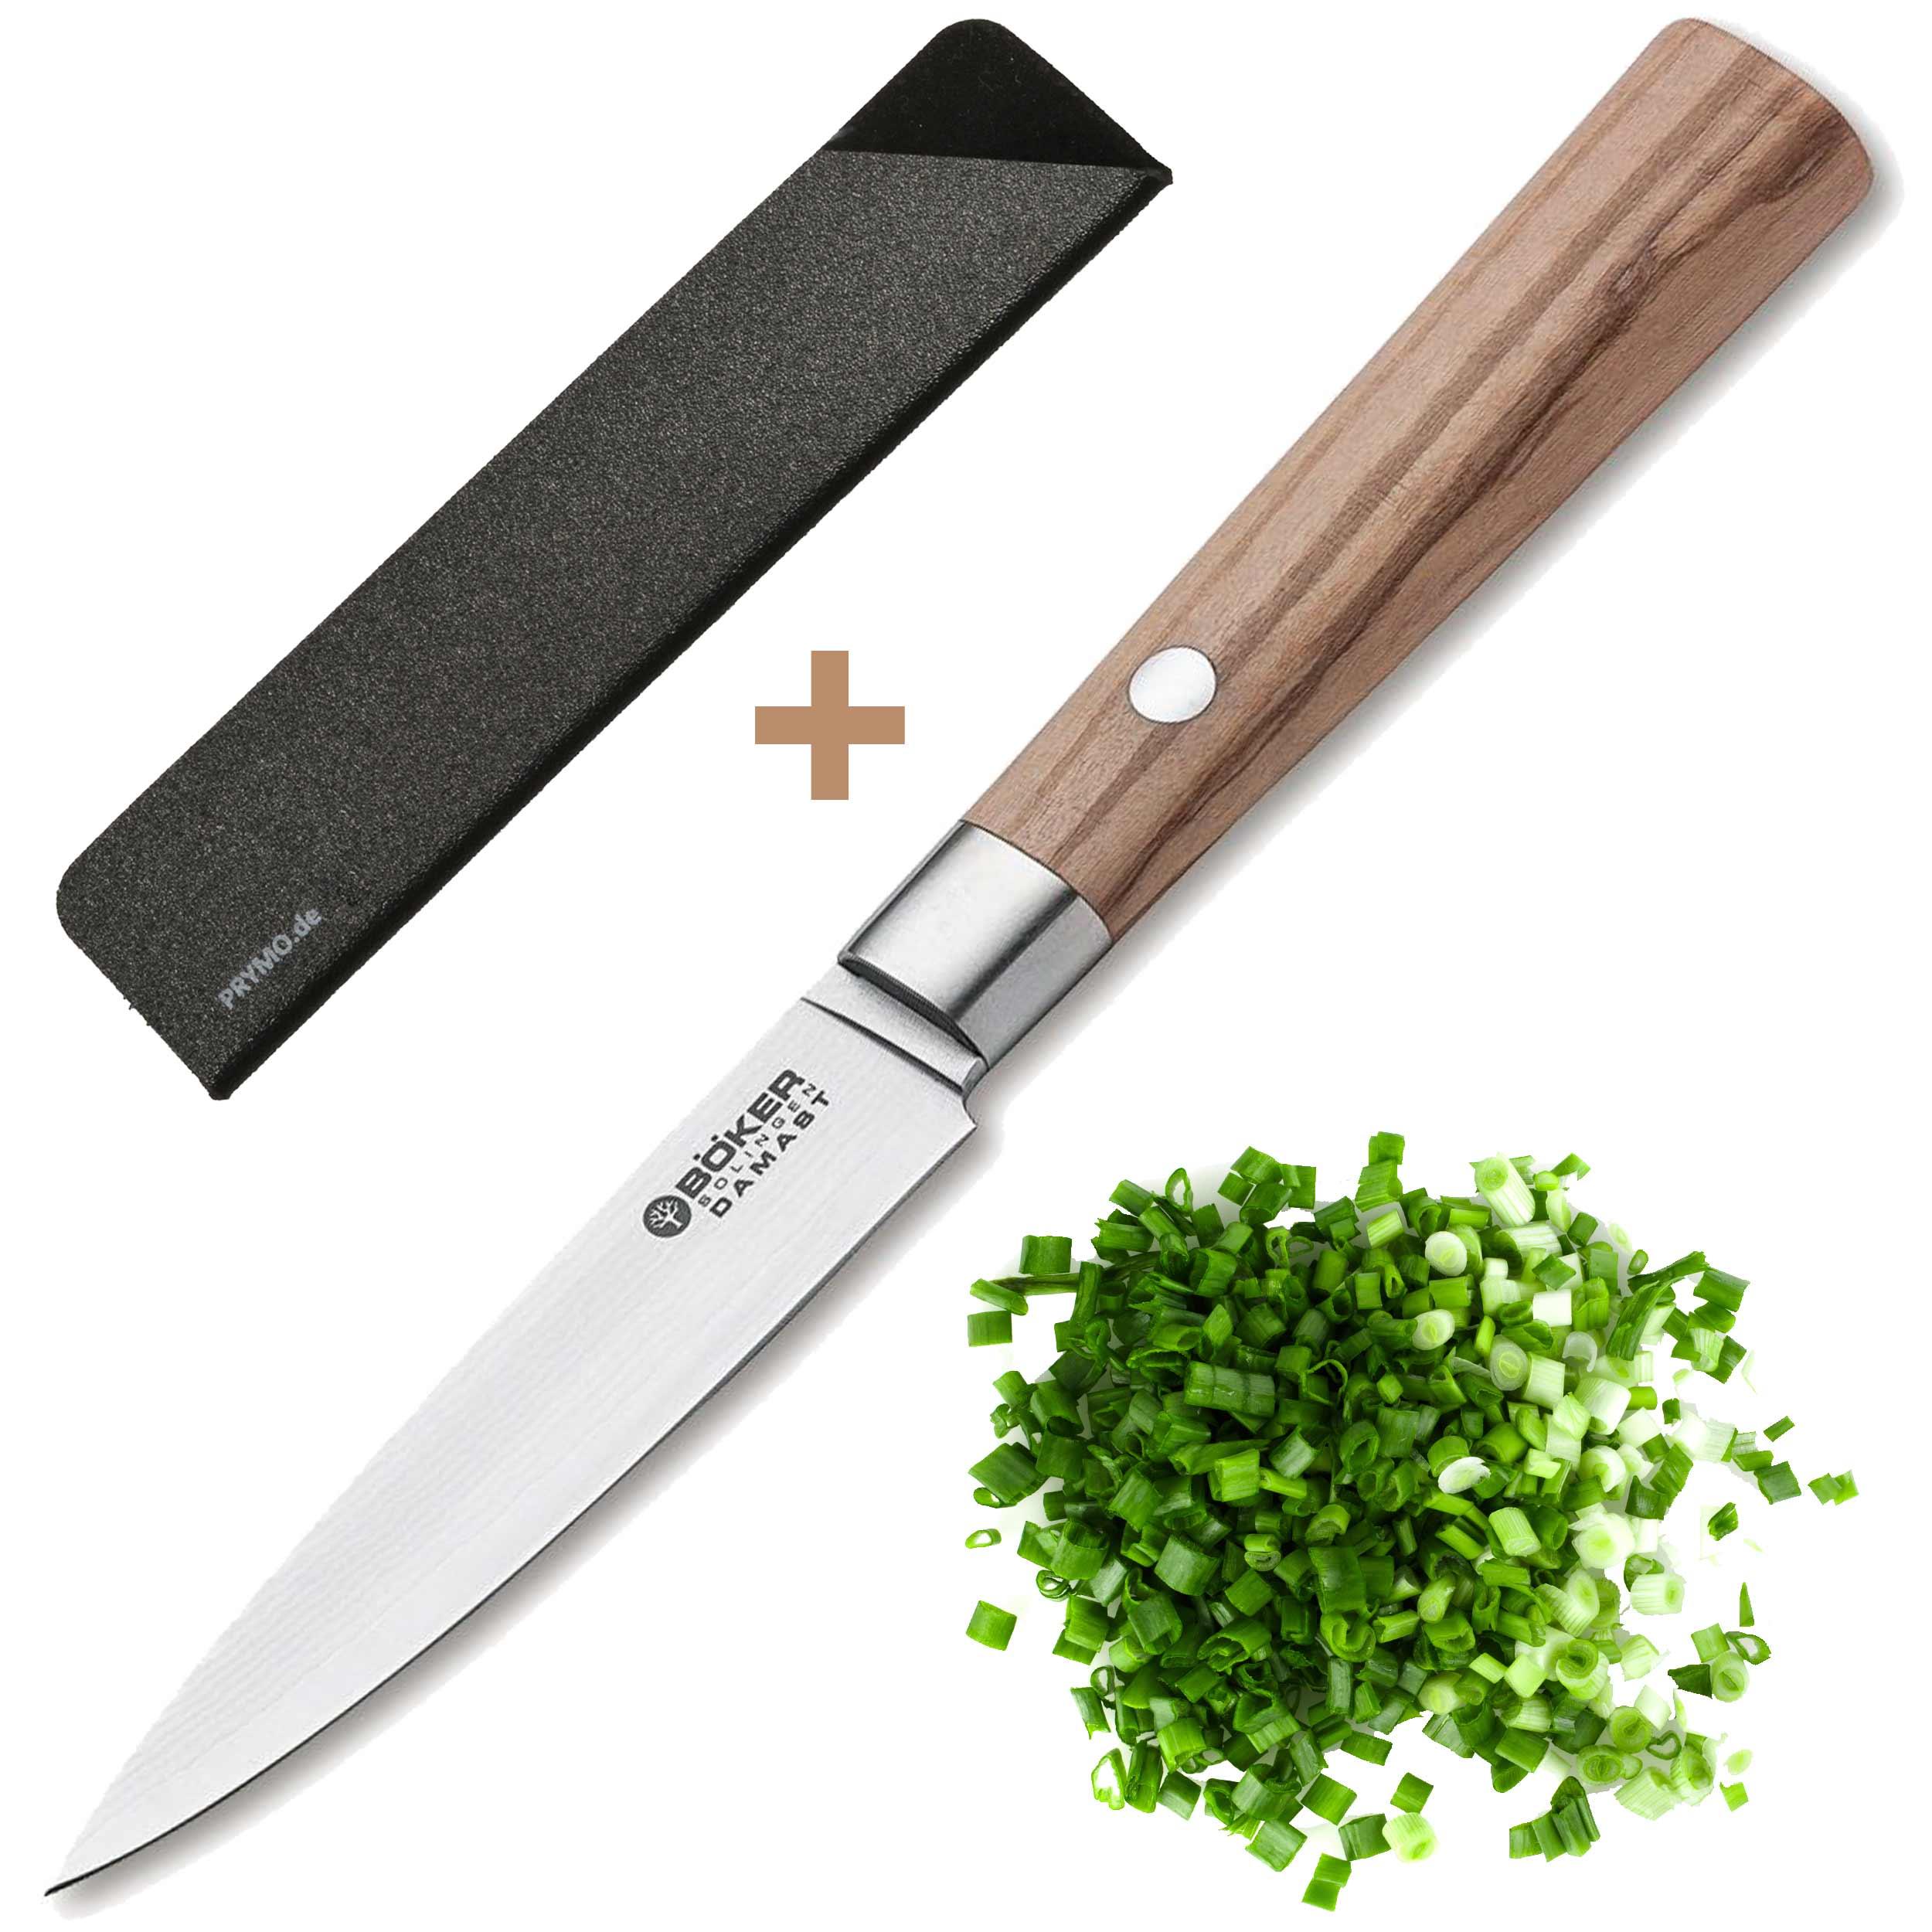 Böker Damast Olive Spickmesser 10cm